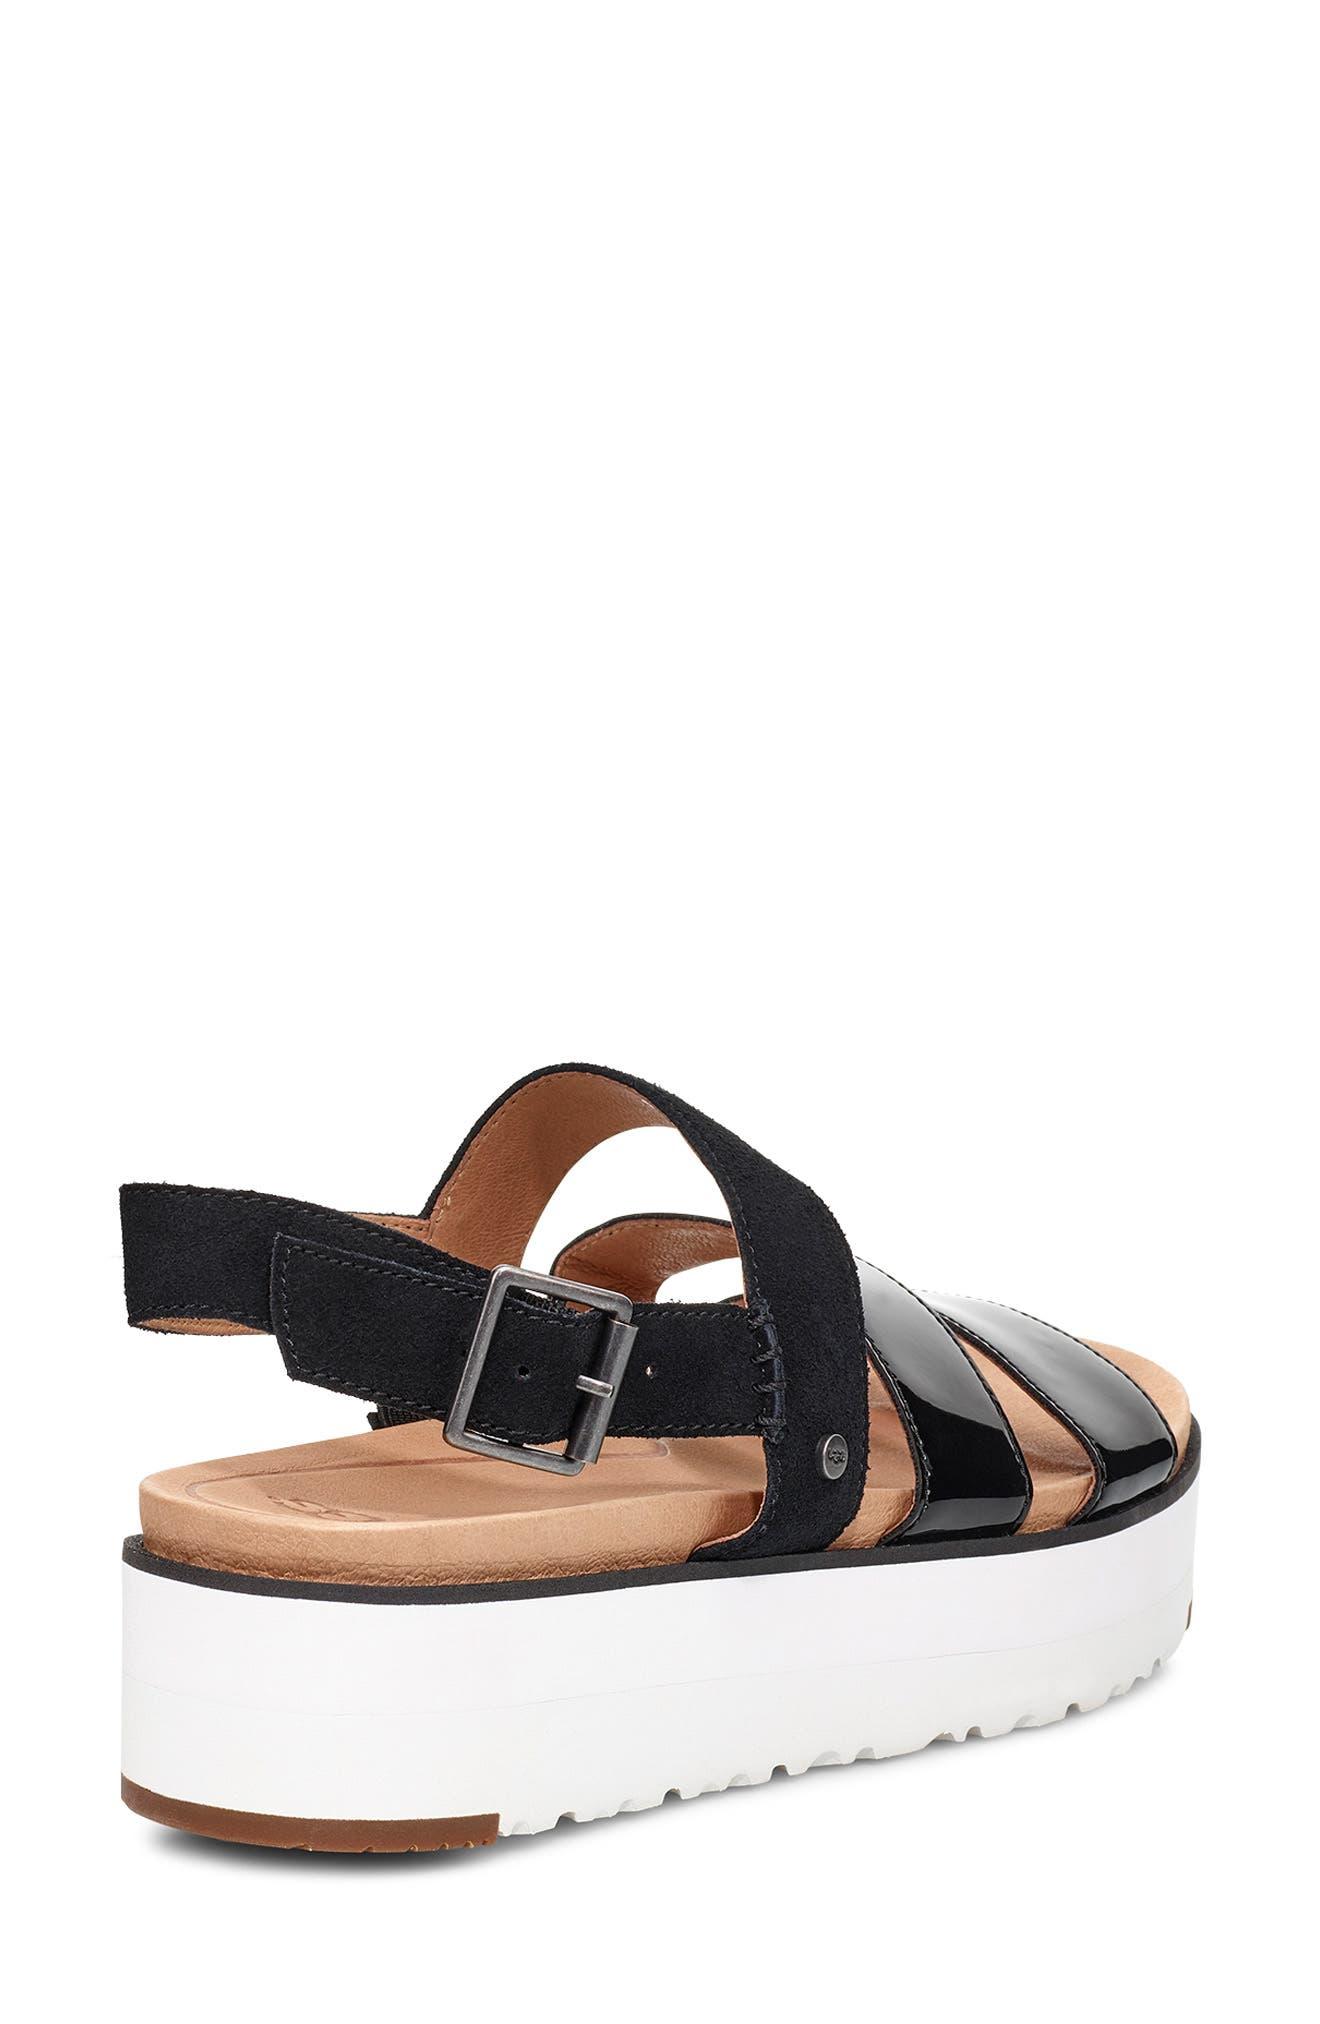 Braelynn Flatform Sandal,                             Alternate thumbnail 2, color,                             BLACK LEATHER